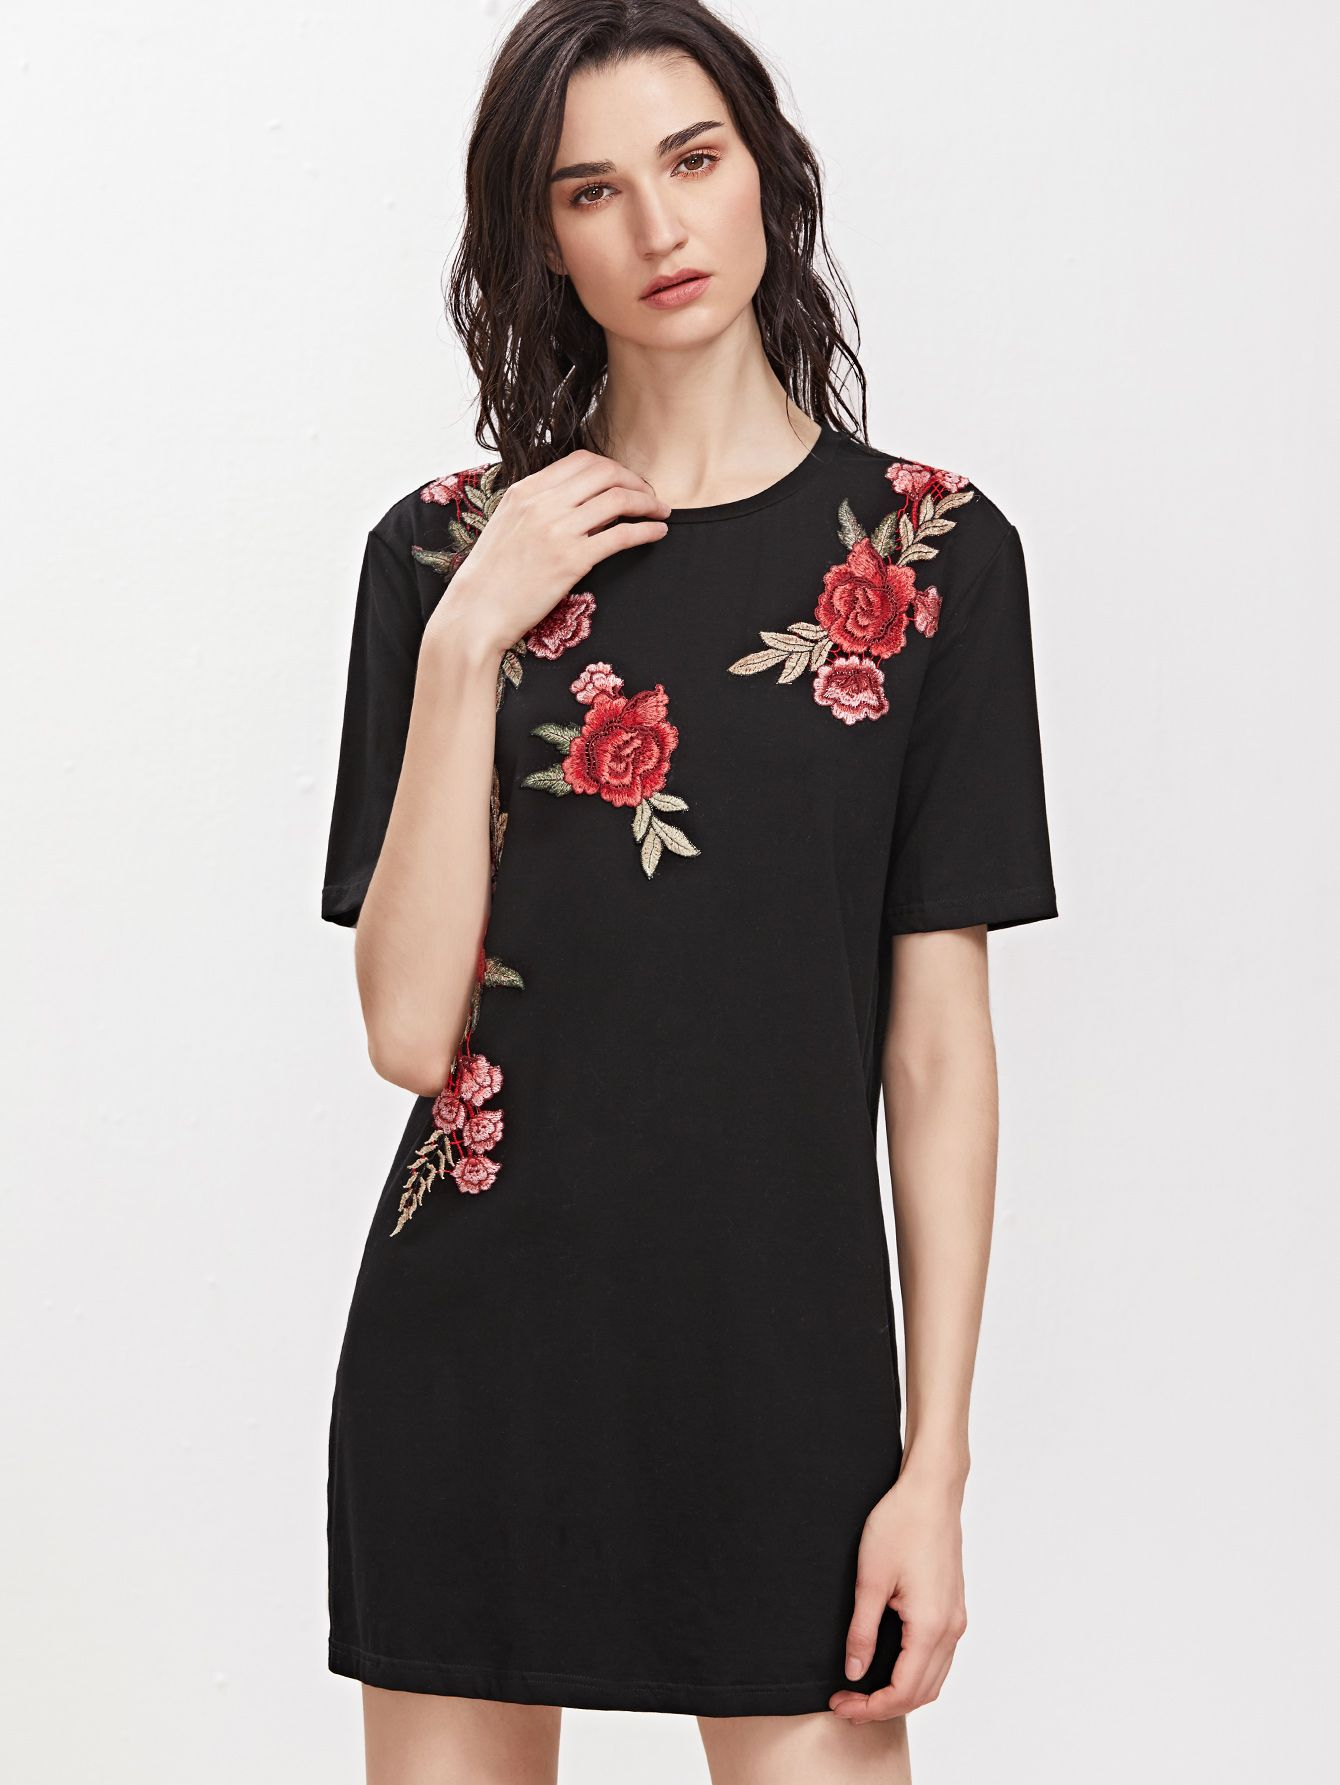 Black embroidered flower applique short sleeve tee dress